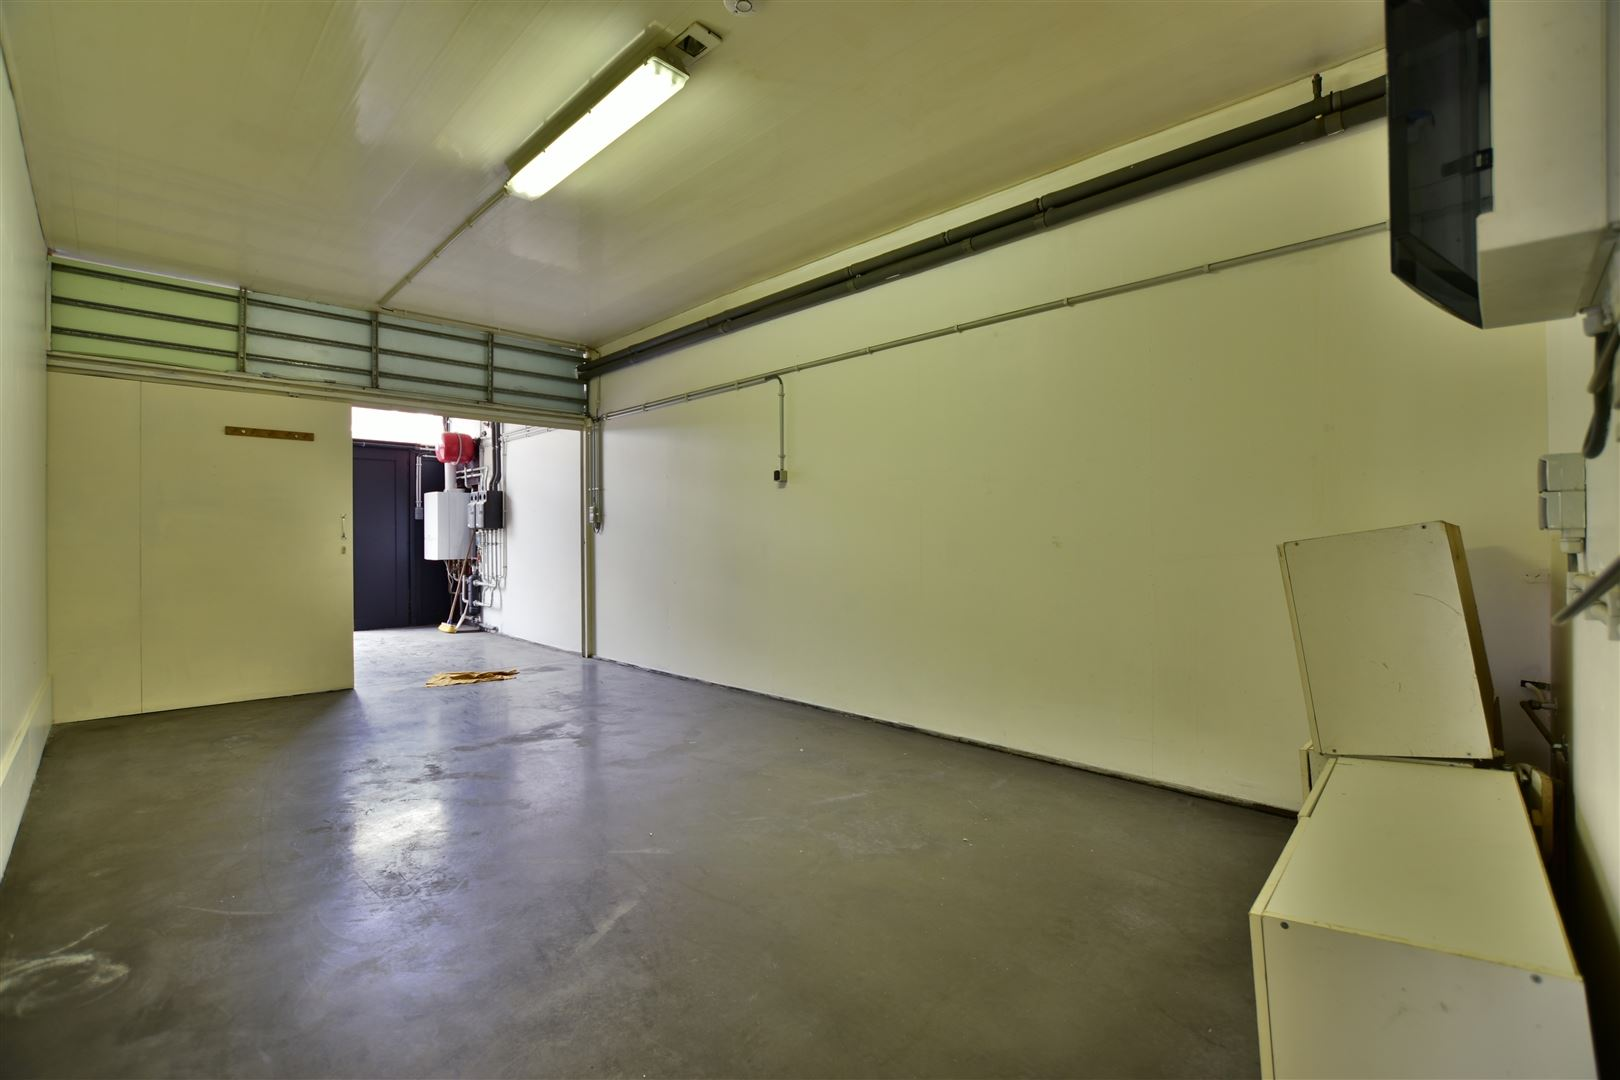 Foto 15 : Kantoorruimte te 9220 HAMME (België) - Prijs € 1.600